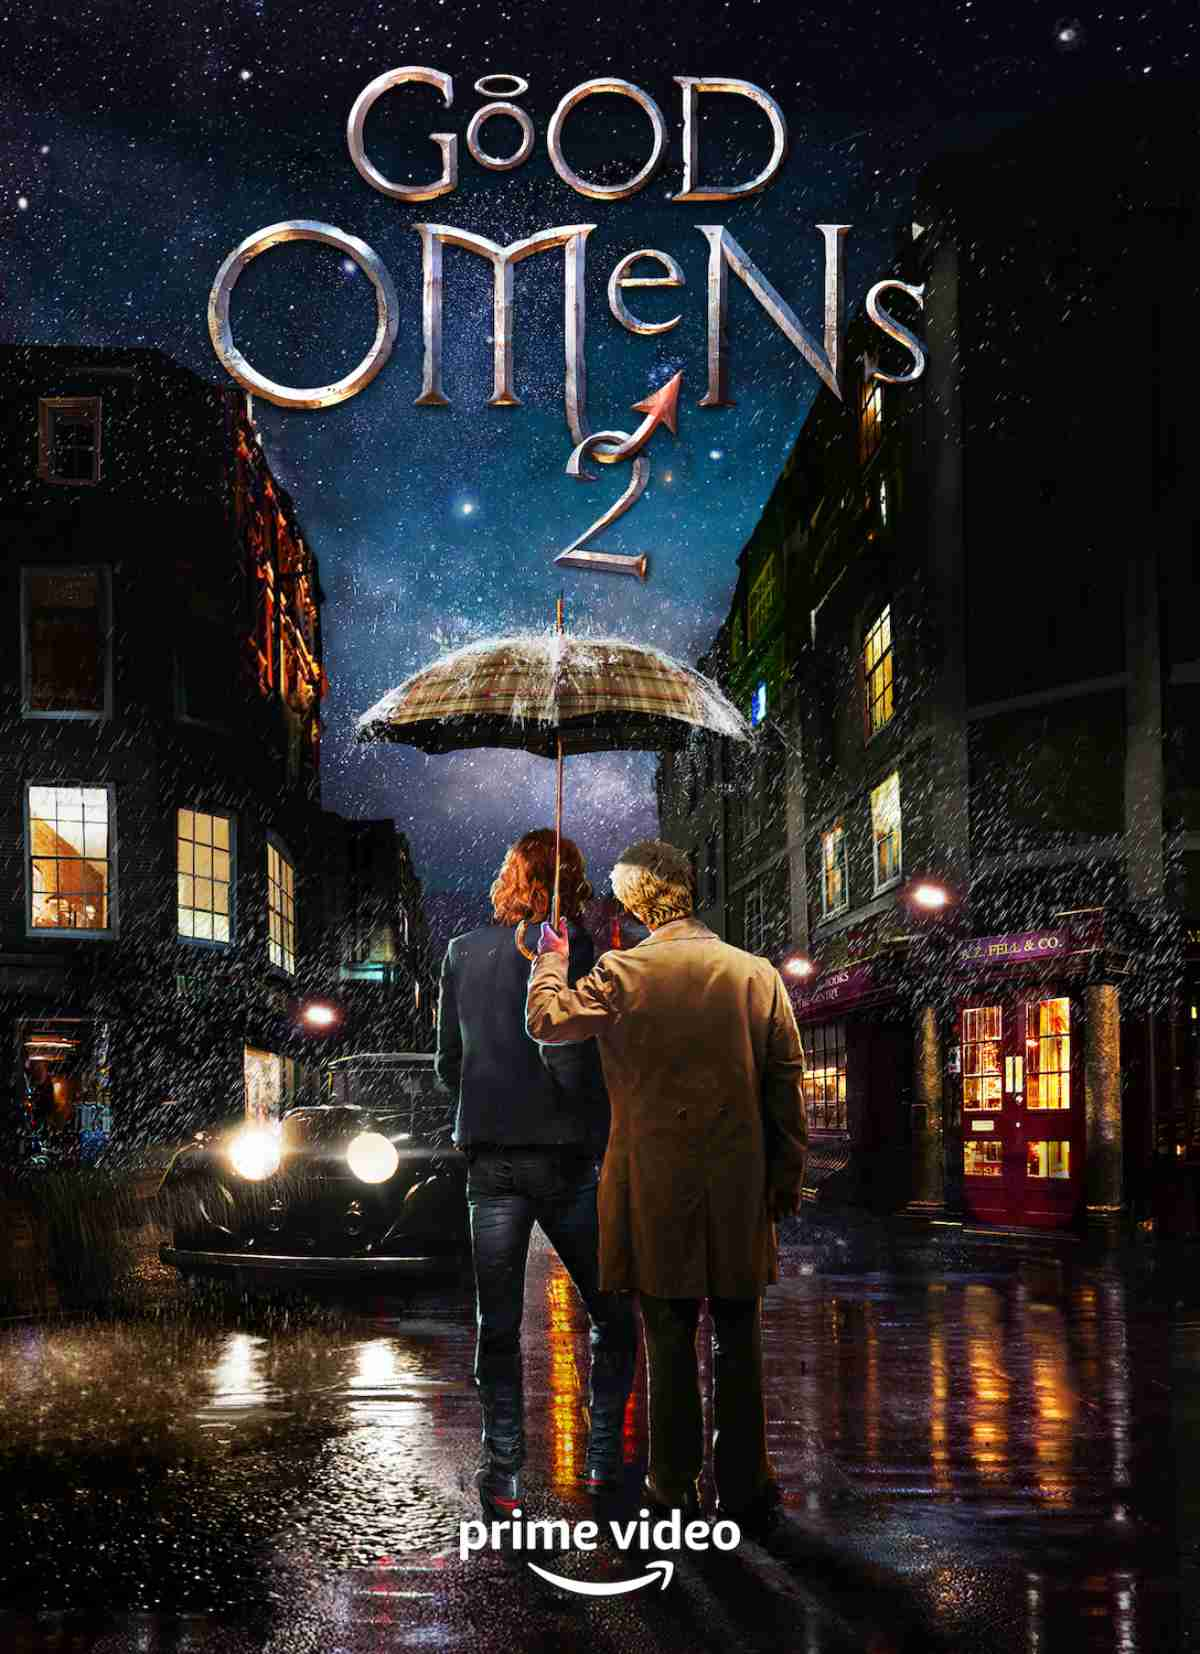 Good Omens Season 2 Poster